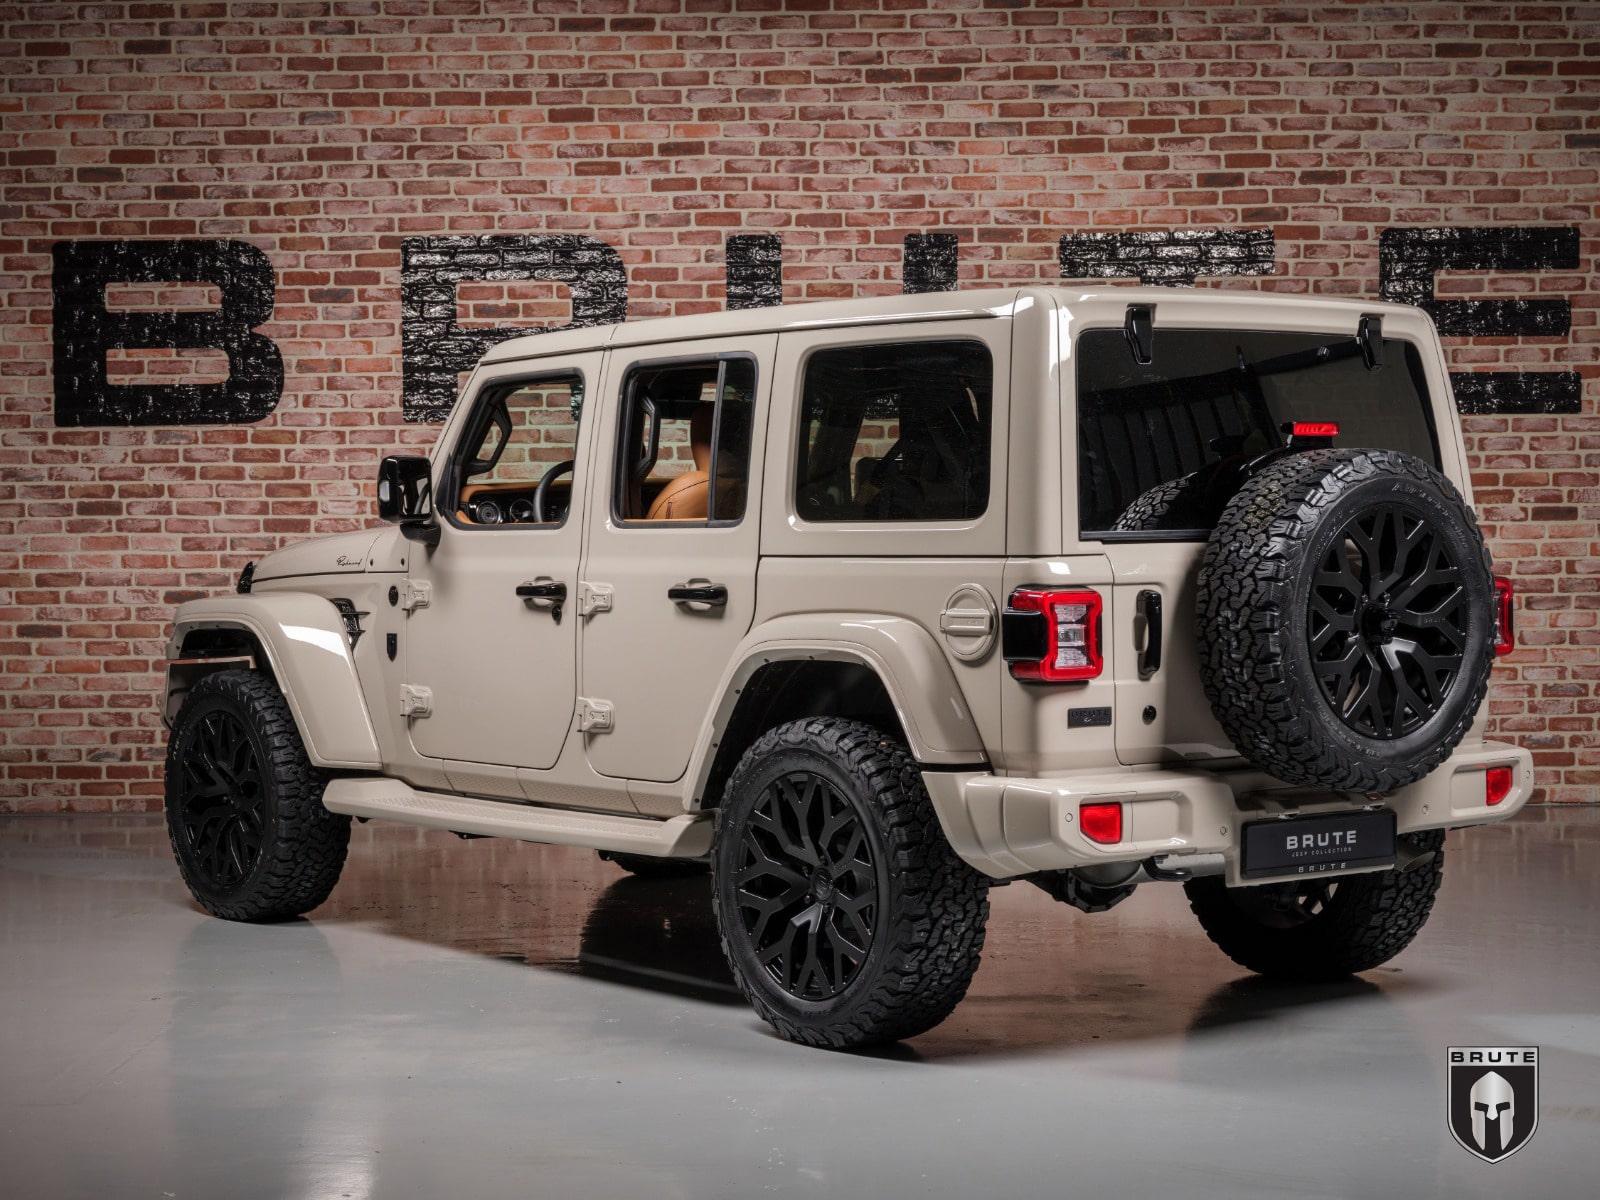 Jeep Brute I